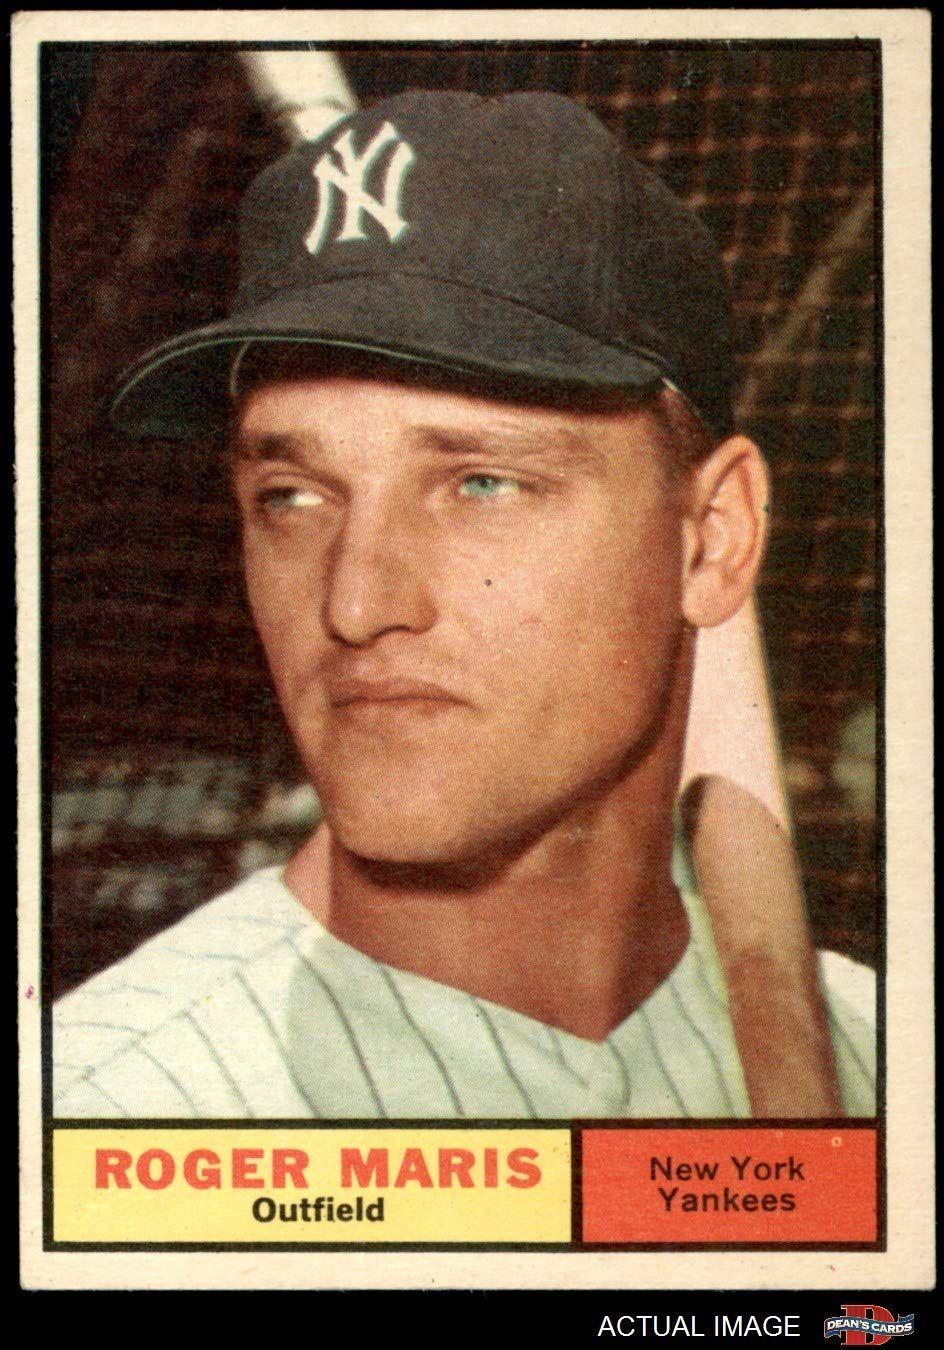 1961 topps 2 roger maris new york yankees baseball card